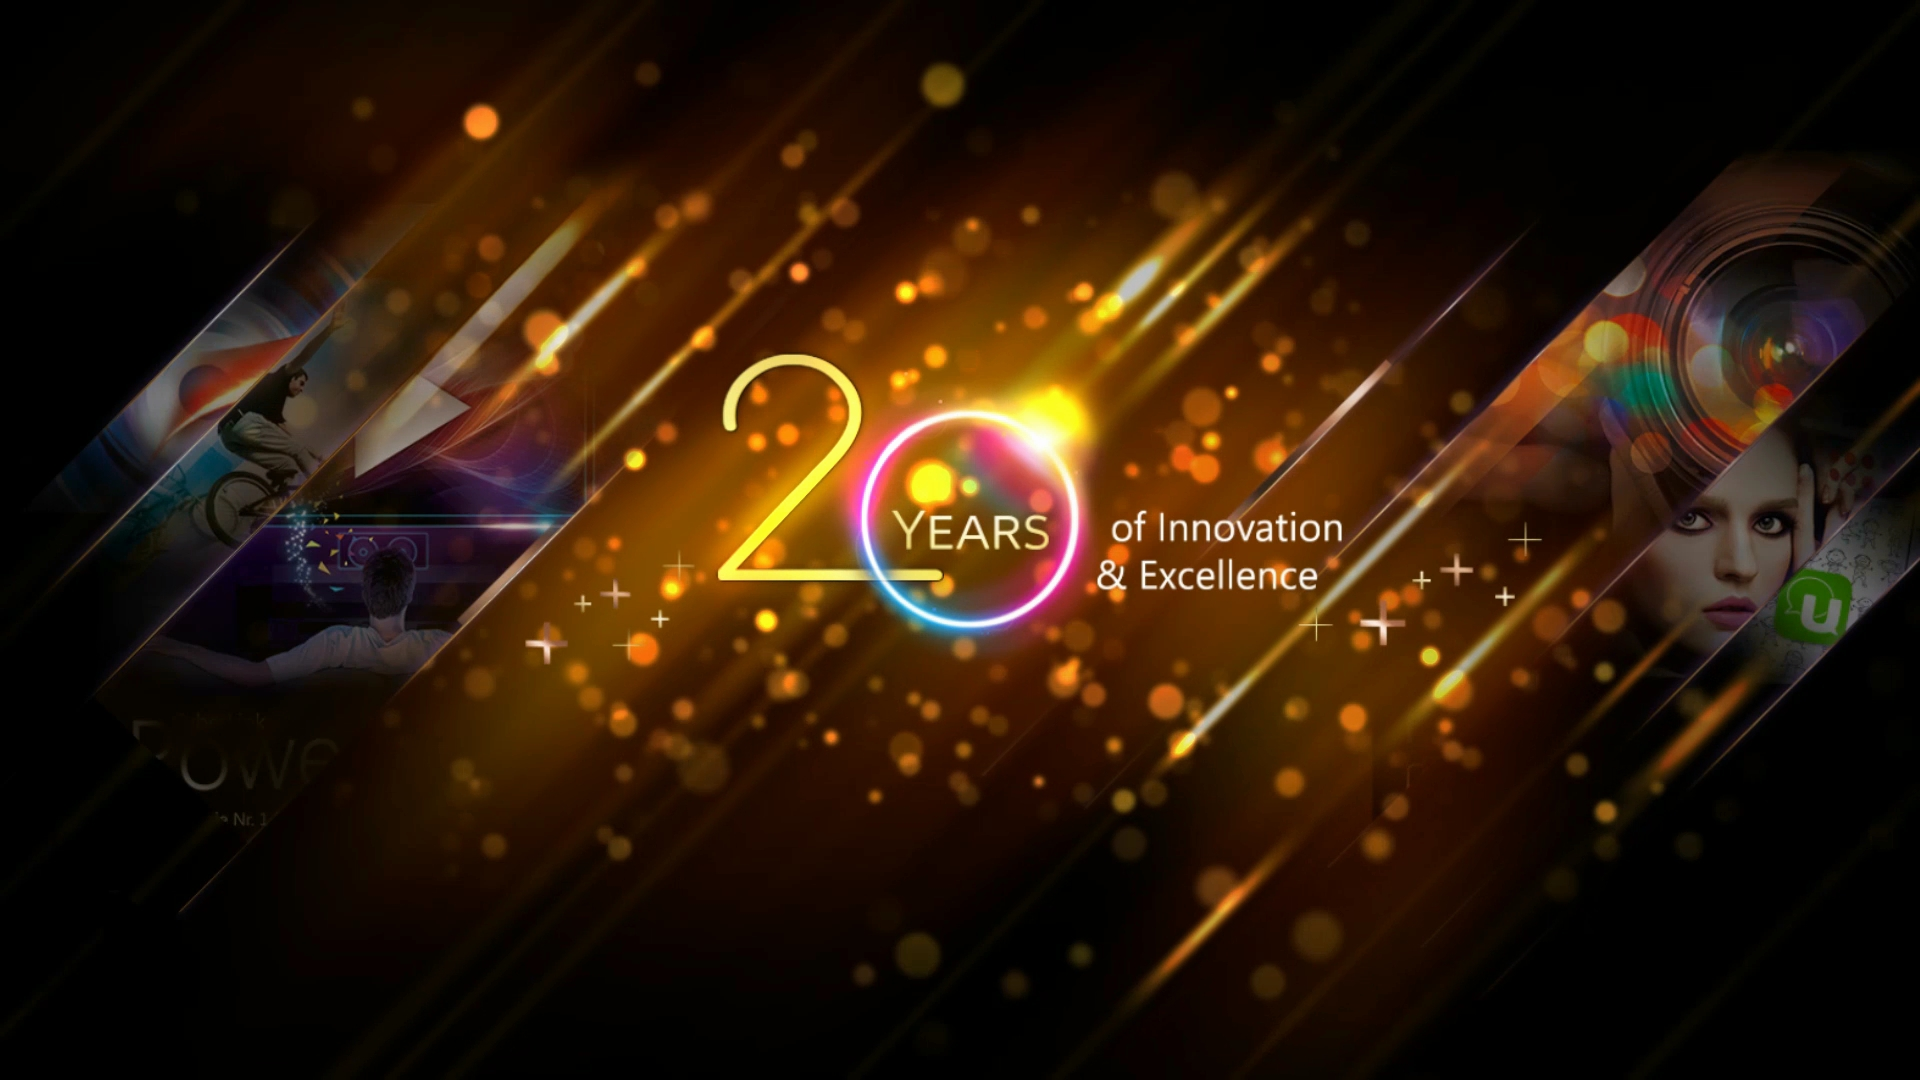 CyberLink Celebrates 20 Year Anniversary